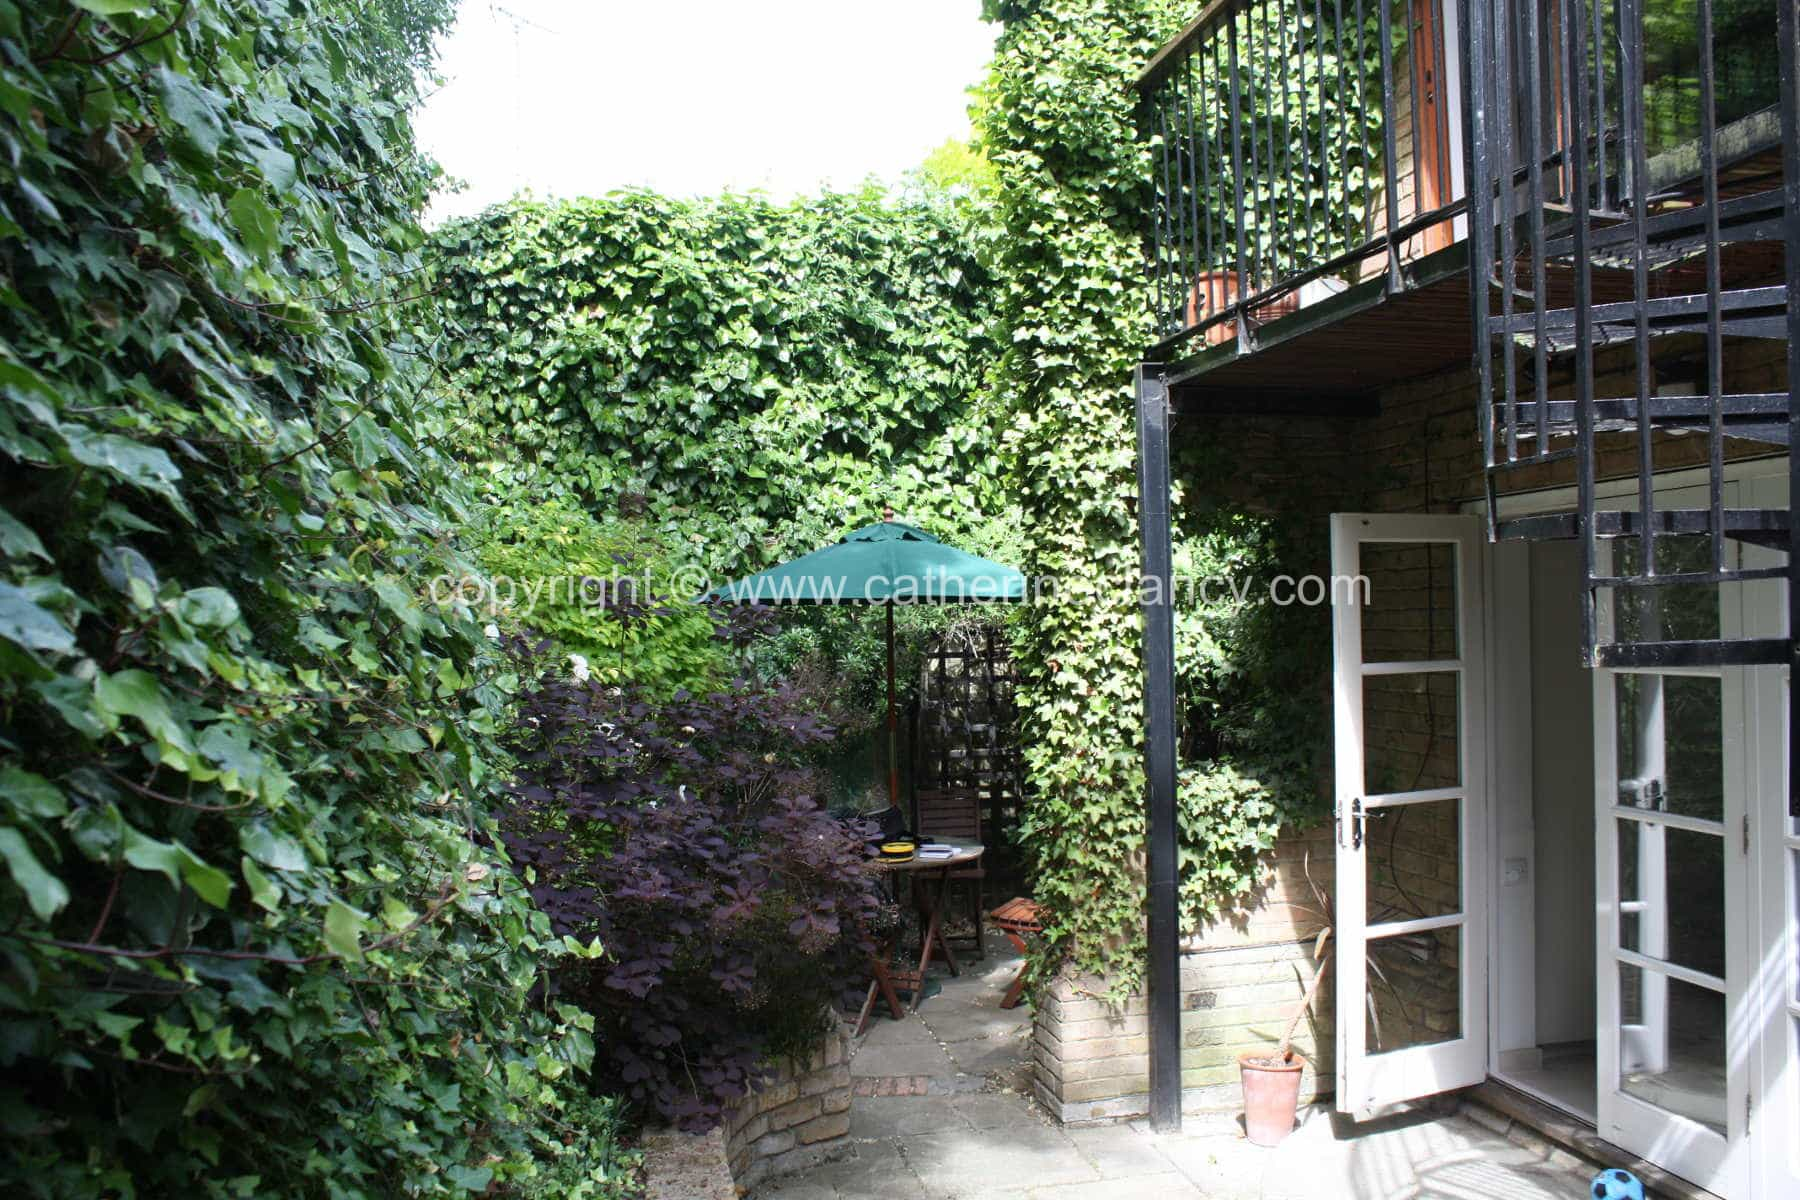 chic-courtyard-17